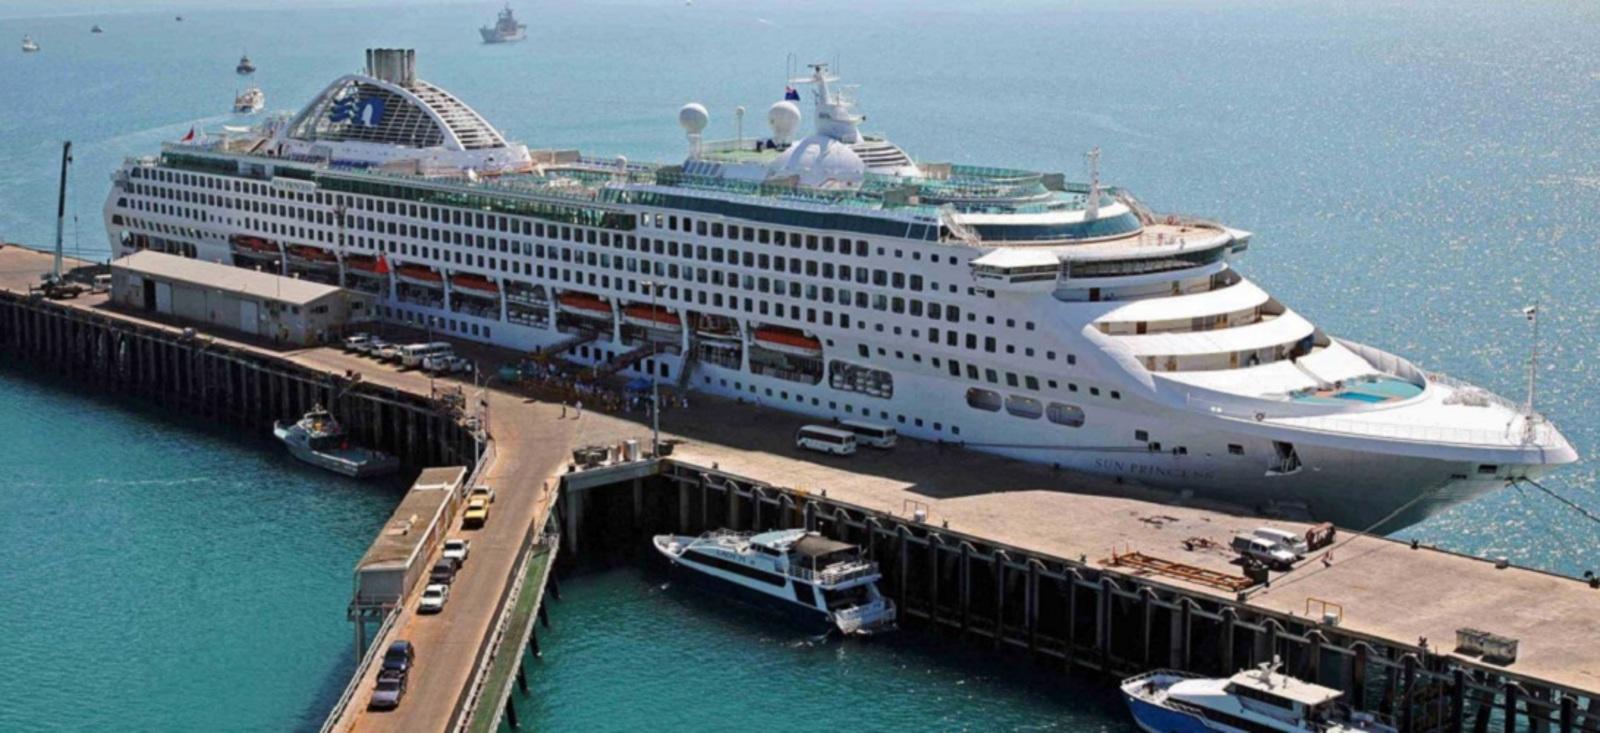 Toward Your Cruise Ship Transportation From Rome To Civitavecchia - Civitavecchia train station to cruise ship